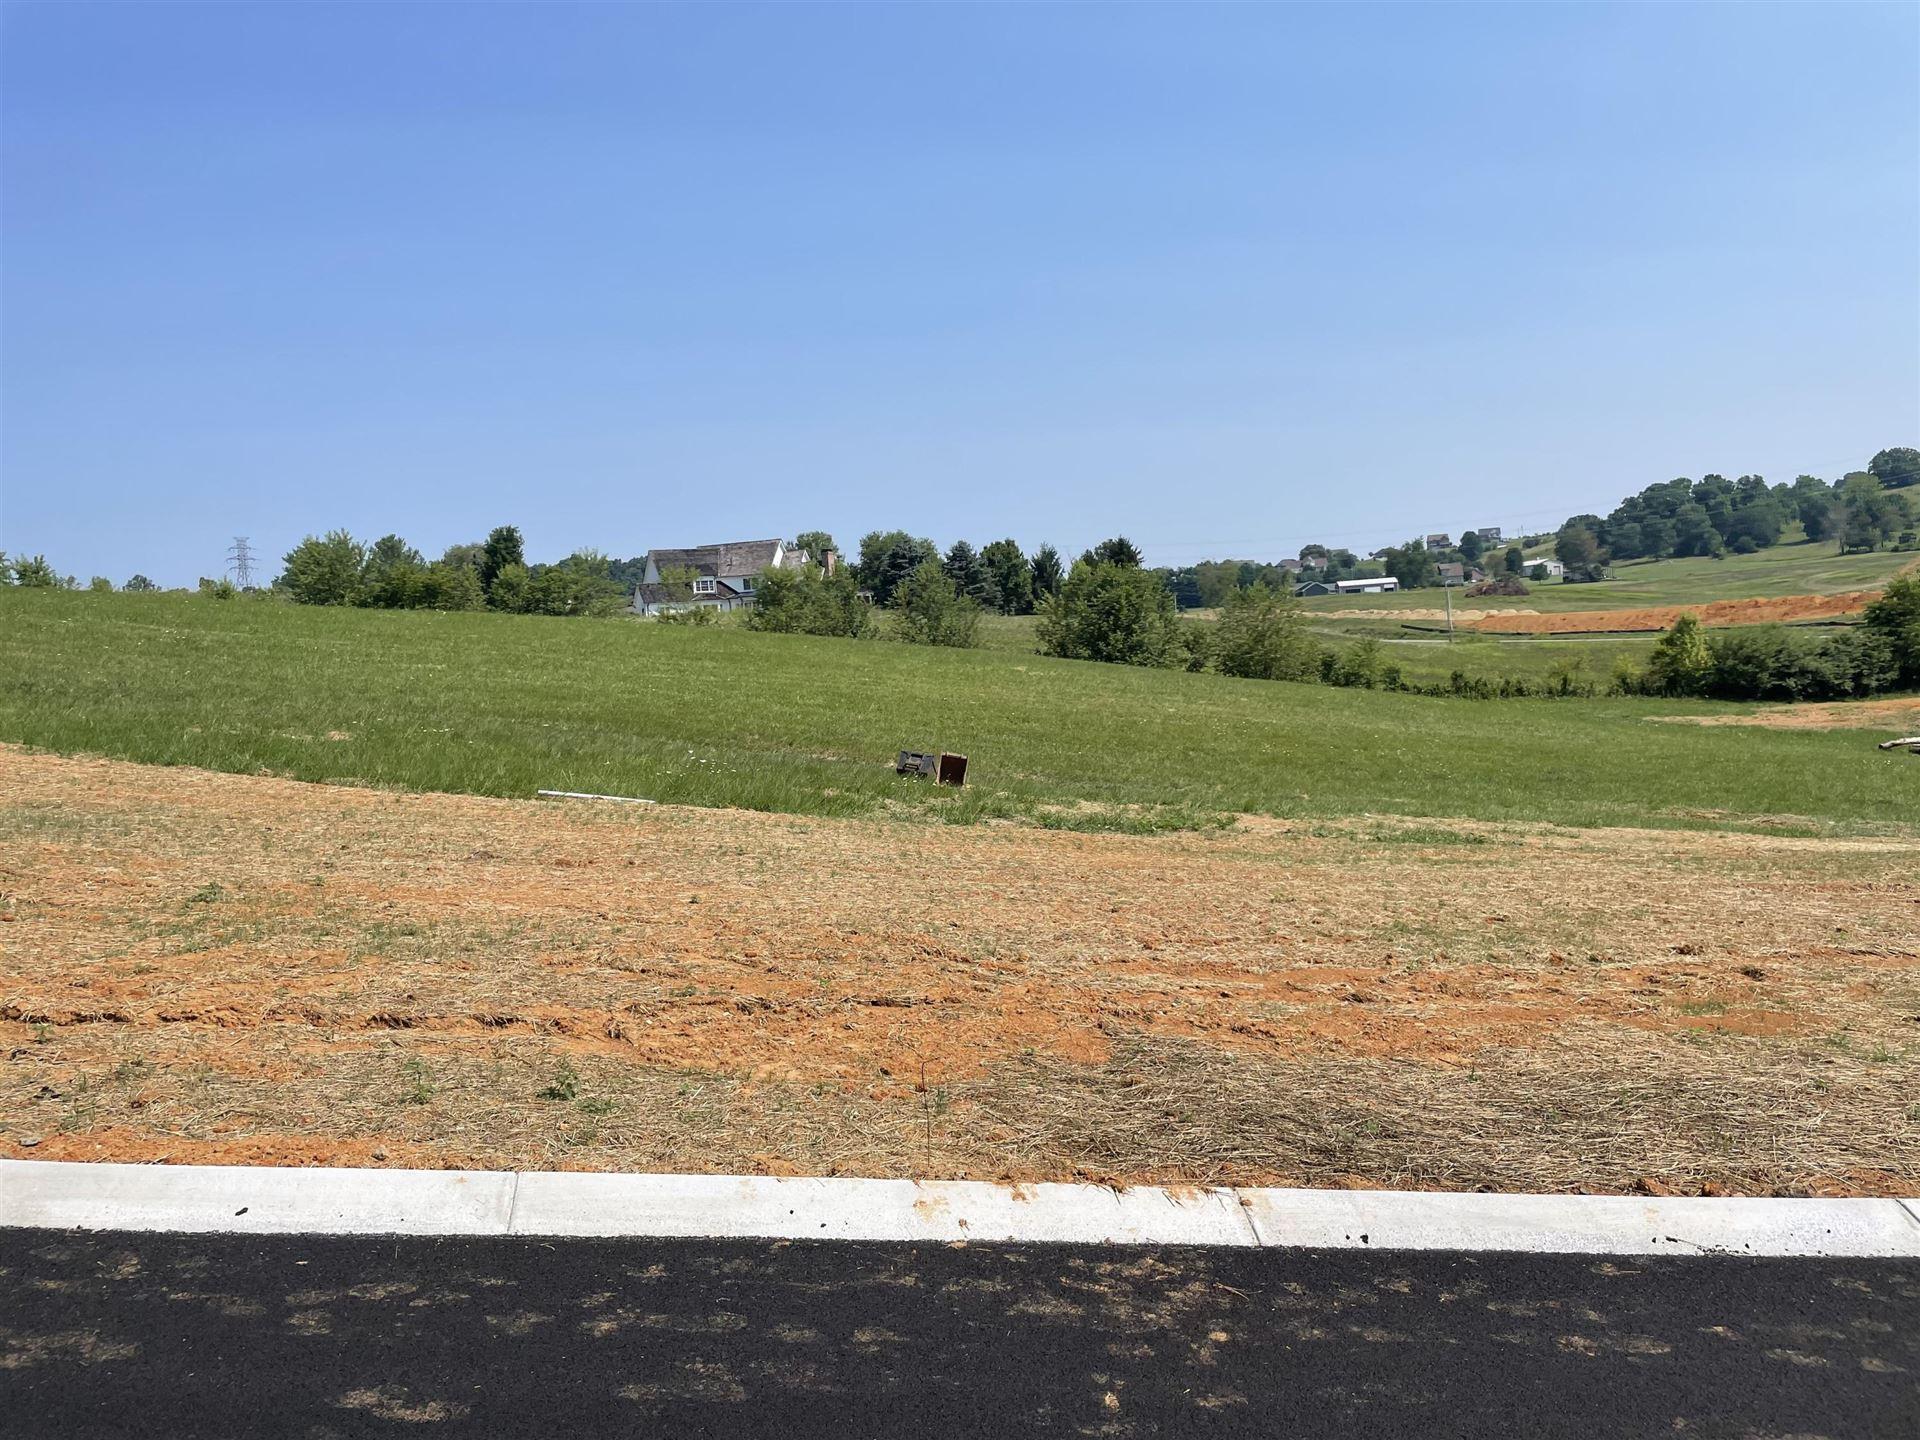 Photo of Lot 6 Charolais Hills, Jonesborough, TN 37659 (MLS # 9919956)